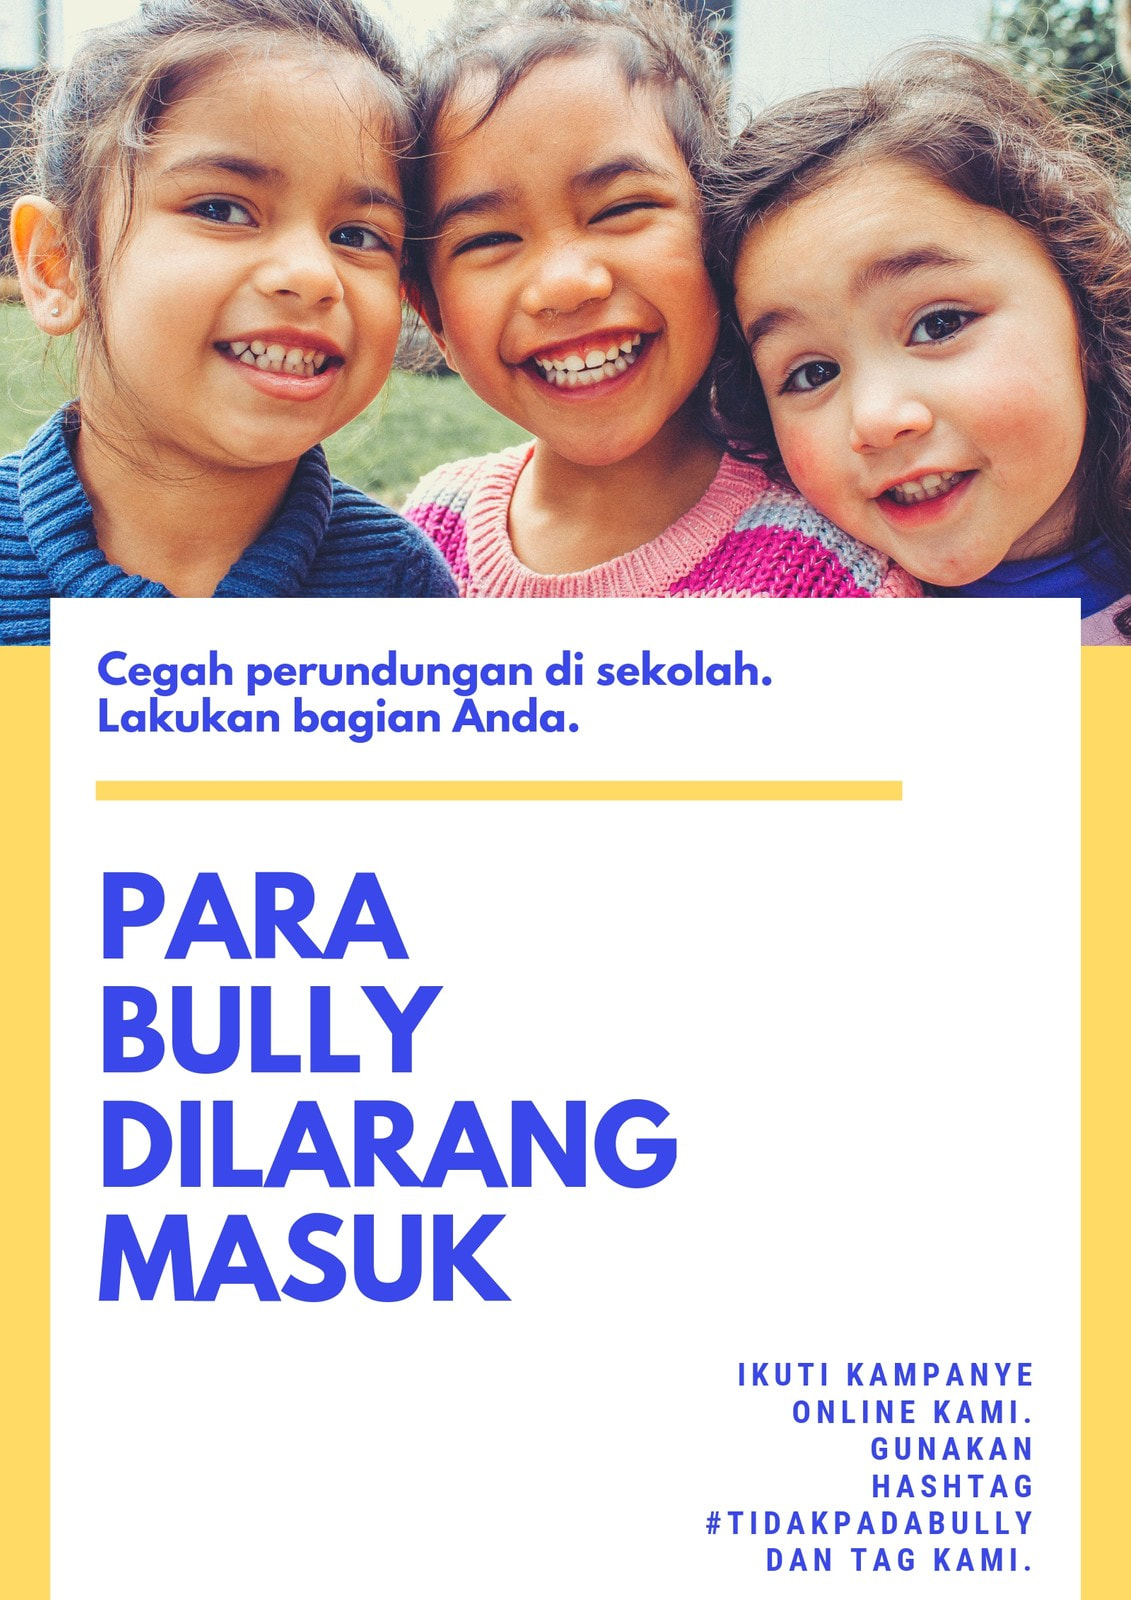 Kuning dan Biru Anak-anak Anti Perundungan Poster